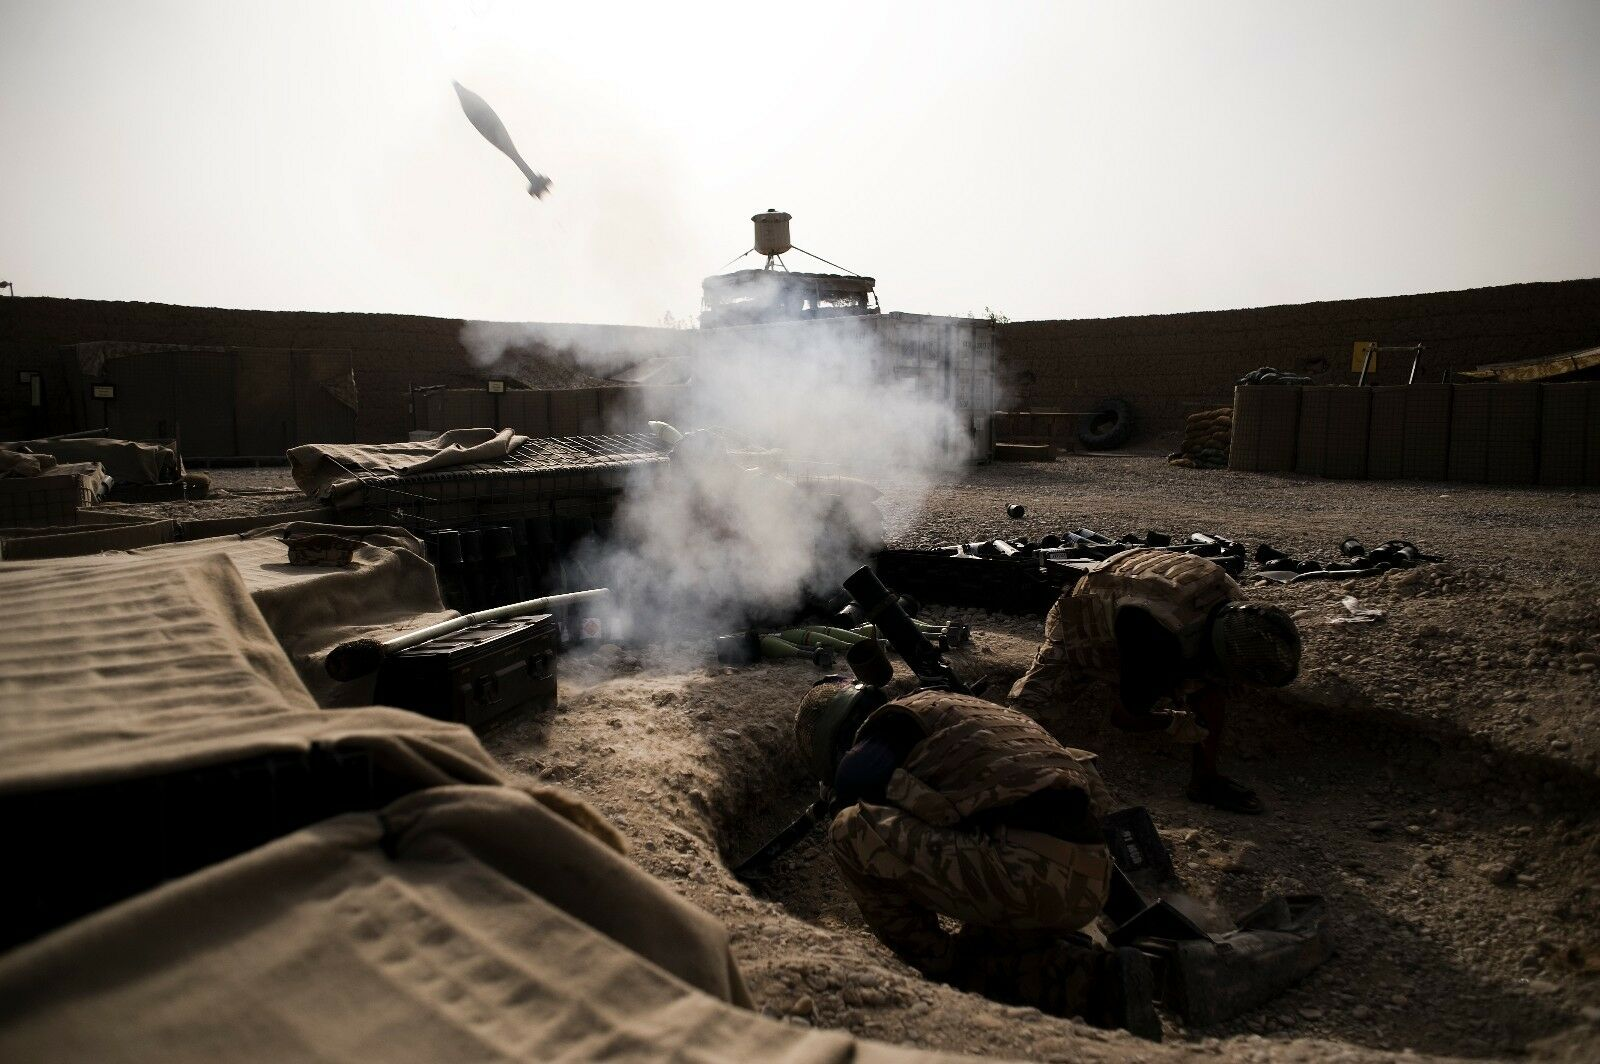 BRITISH ARMY 1 GURKHA REG  FIRING 81MM MORTAR  Military Photo Print